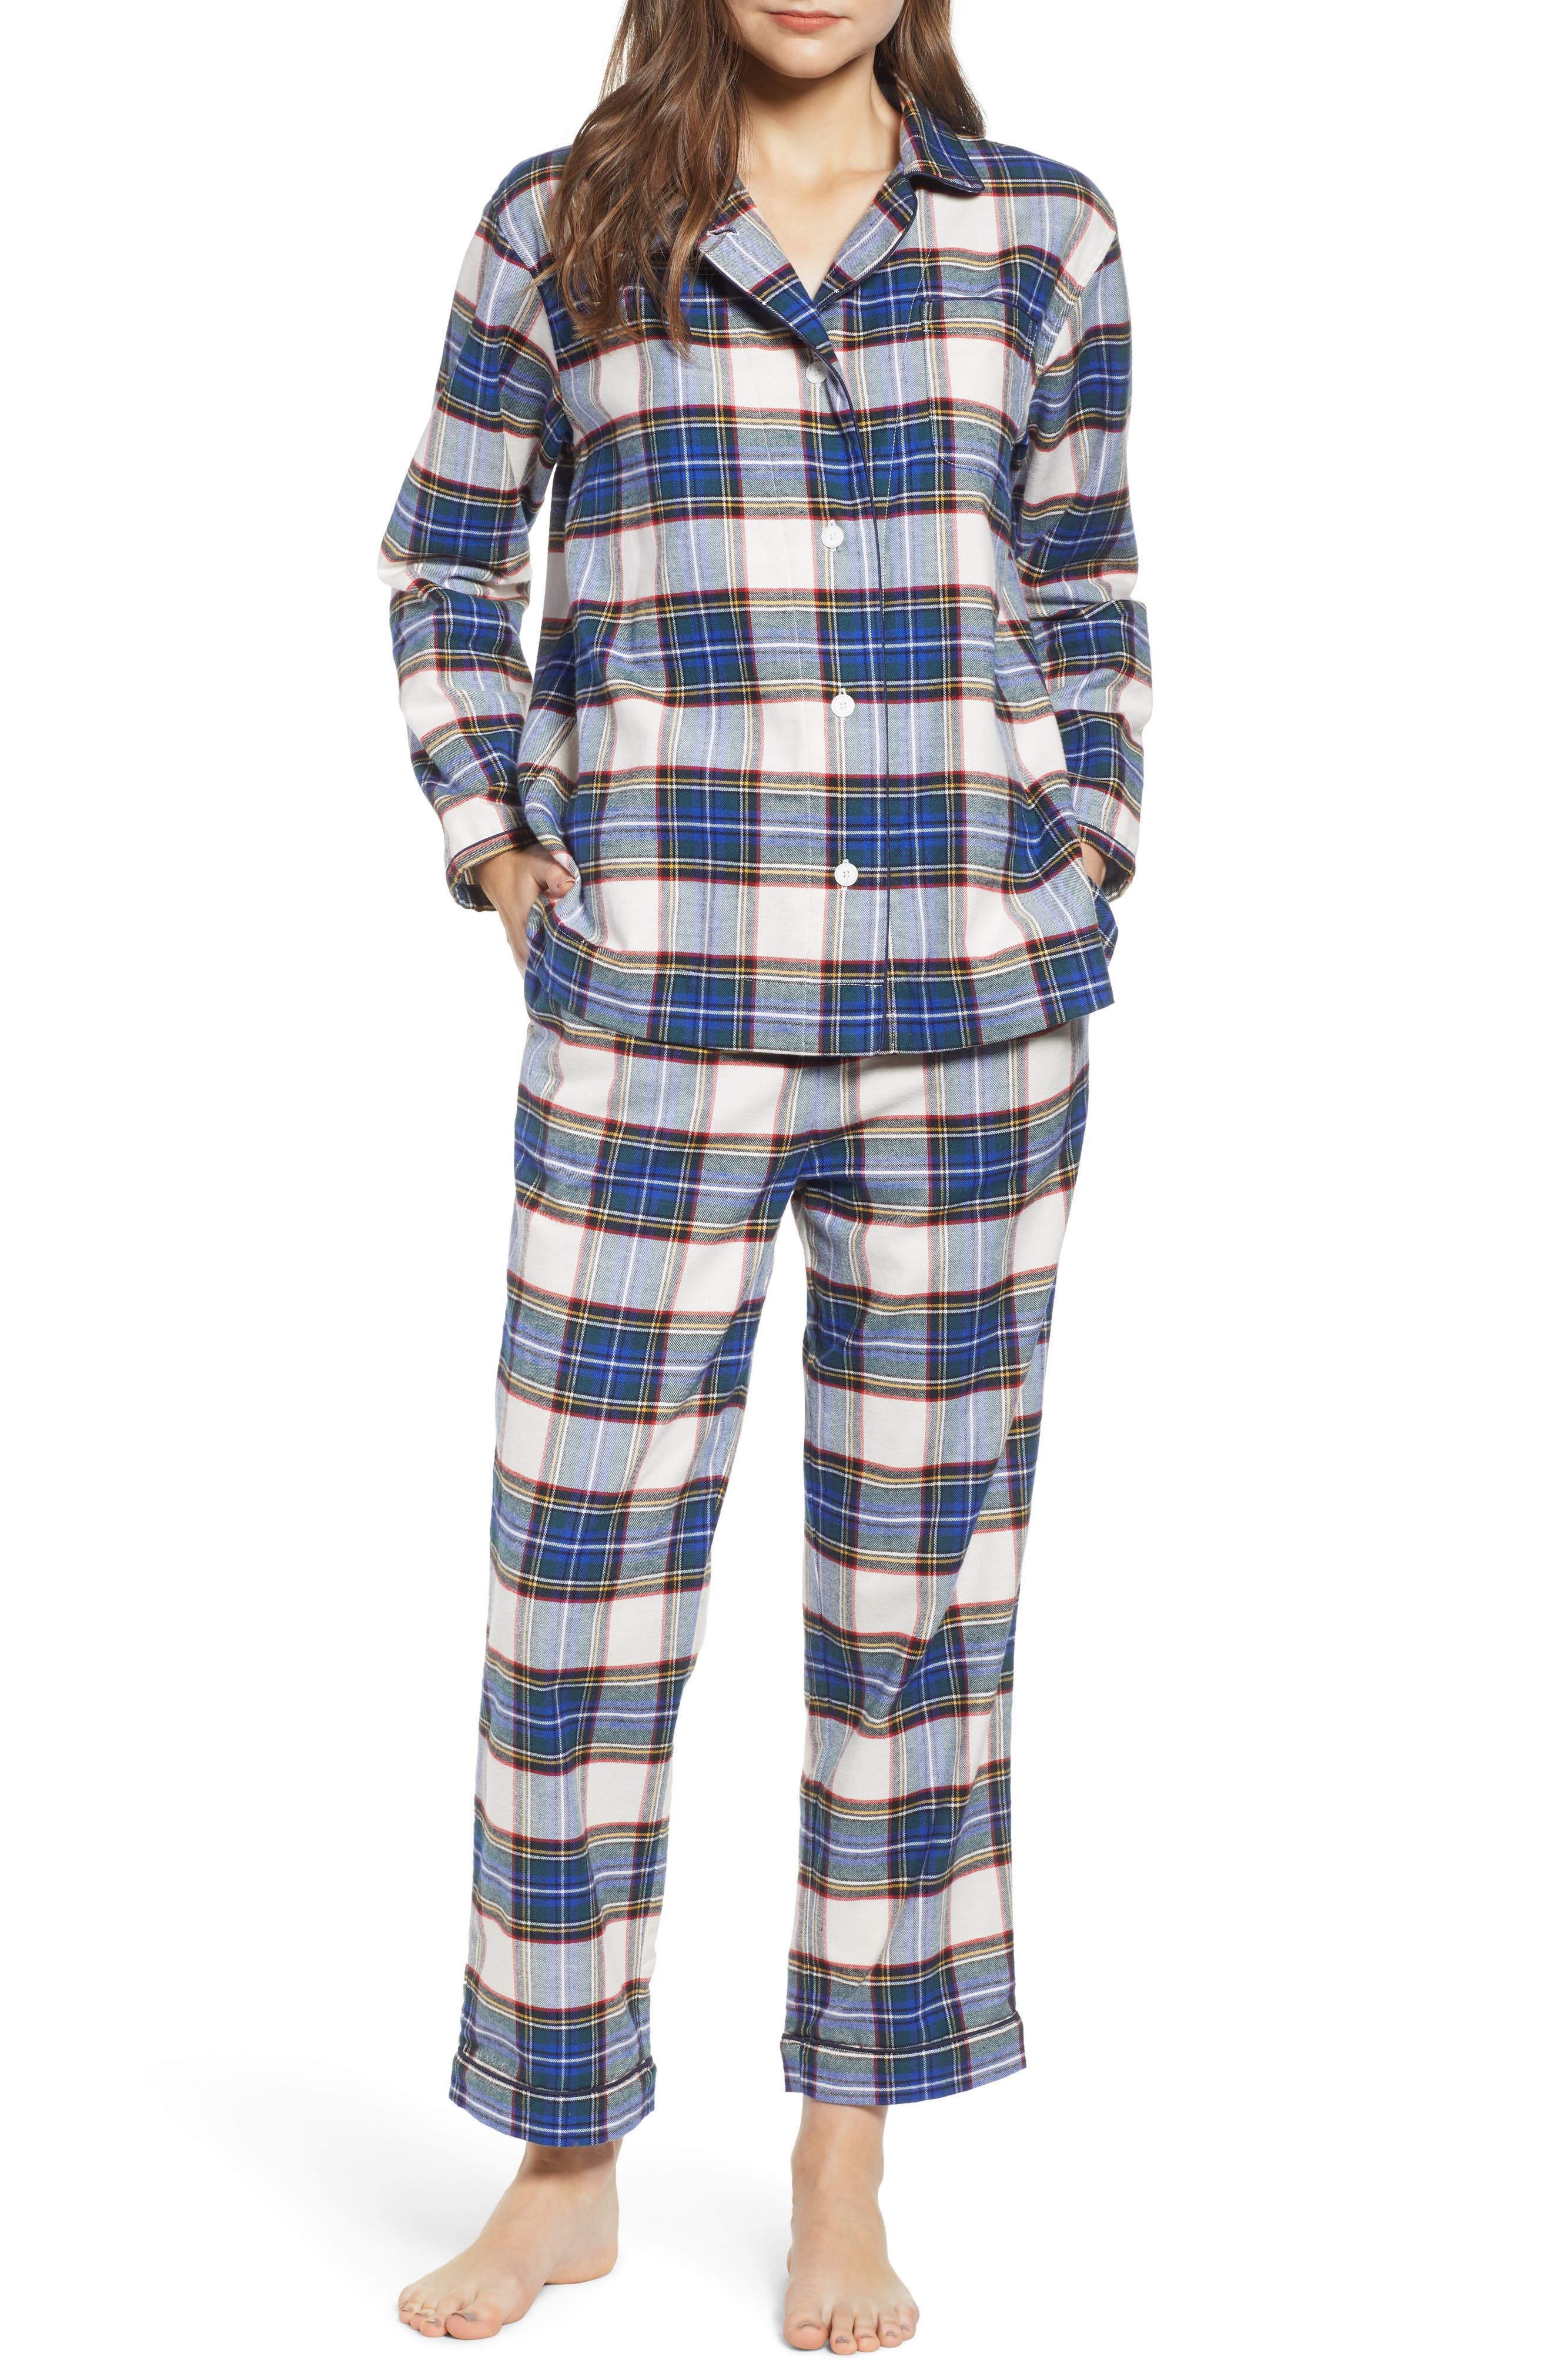 Bishop Women's Pajamas,                             Main thumbnail 1, color,                             FLANNEL PLAID